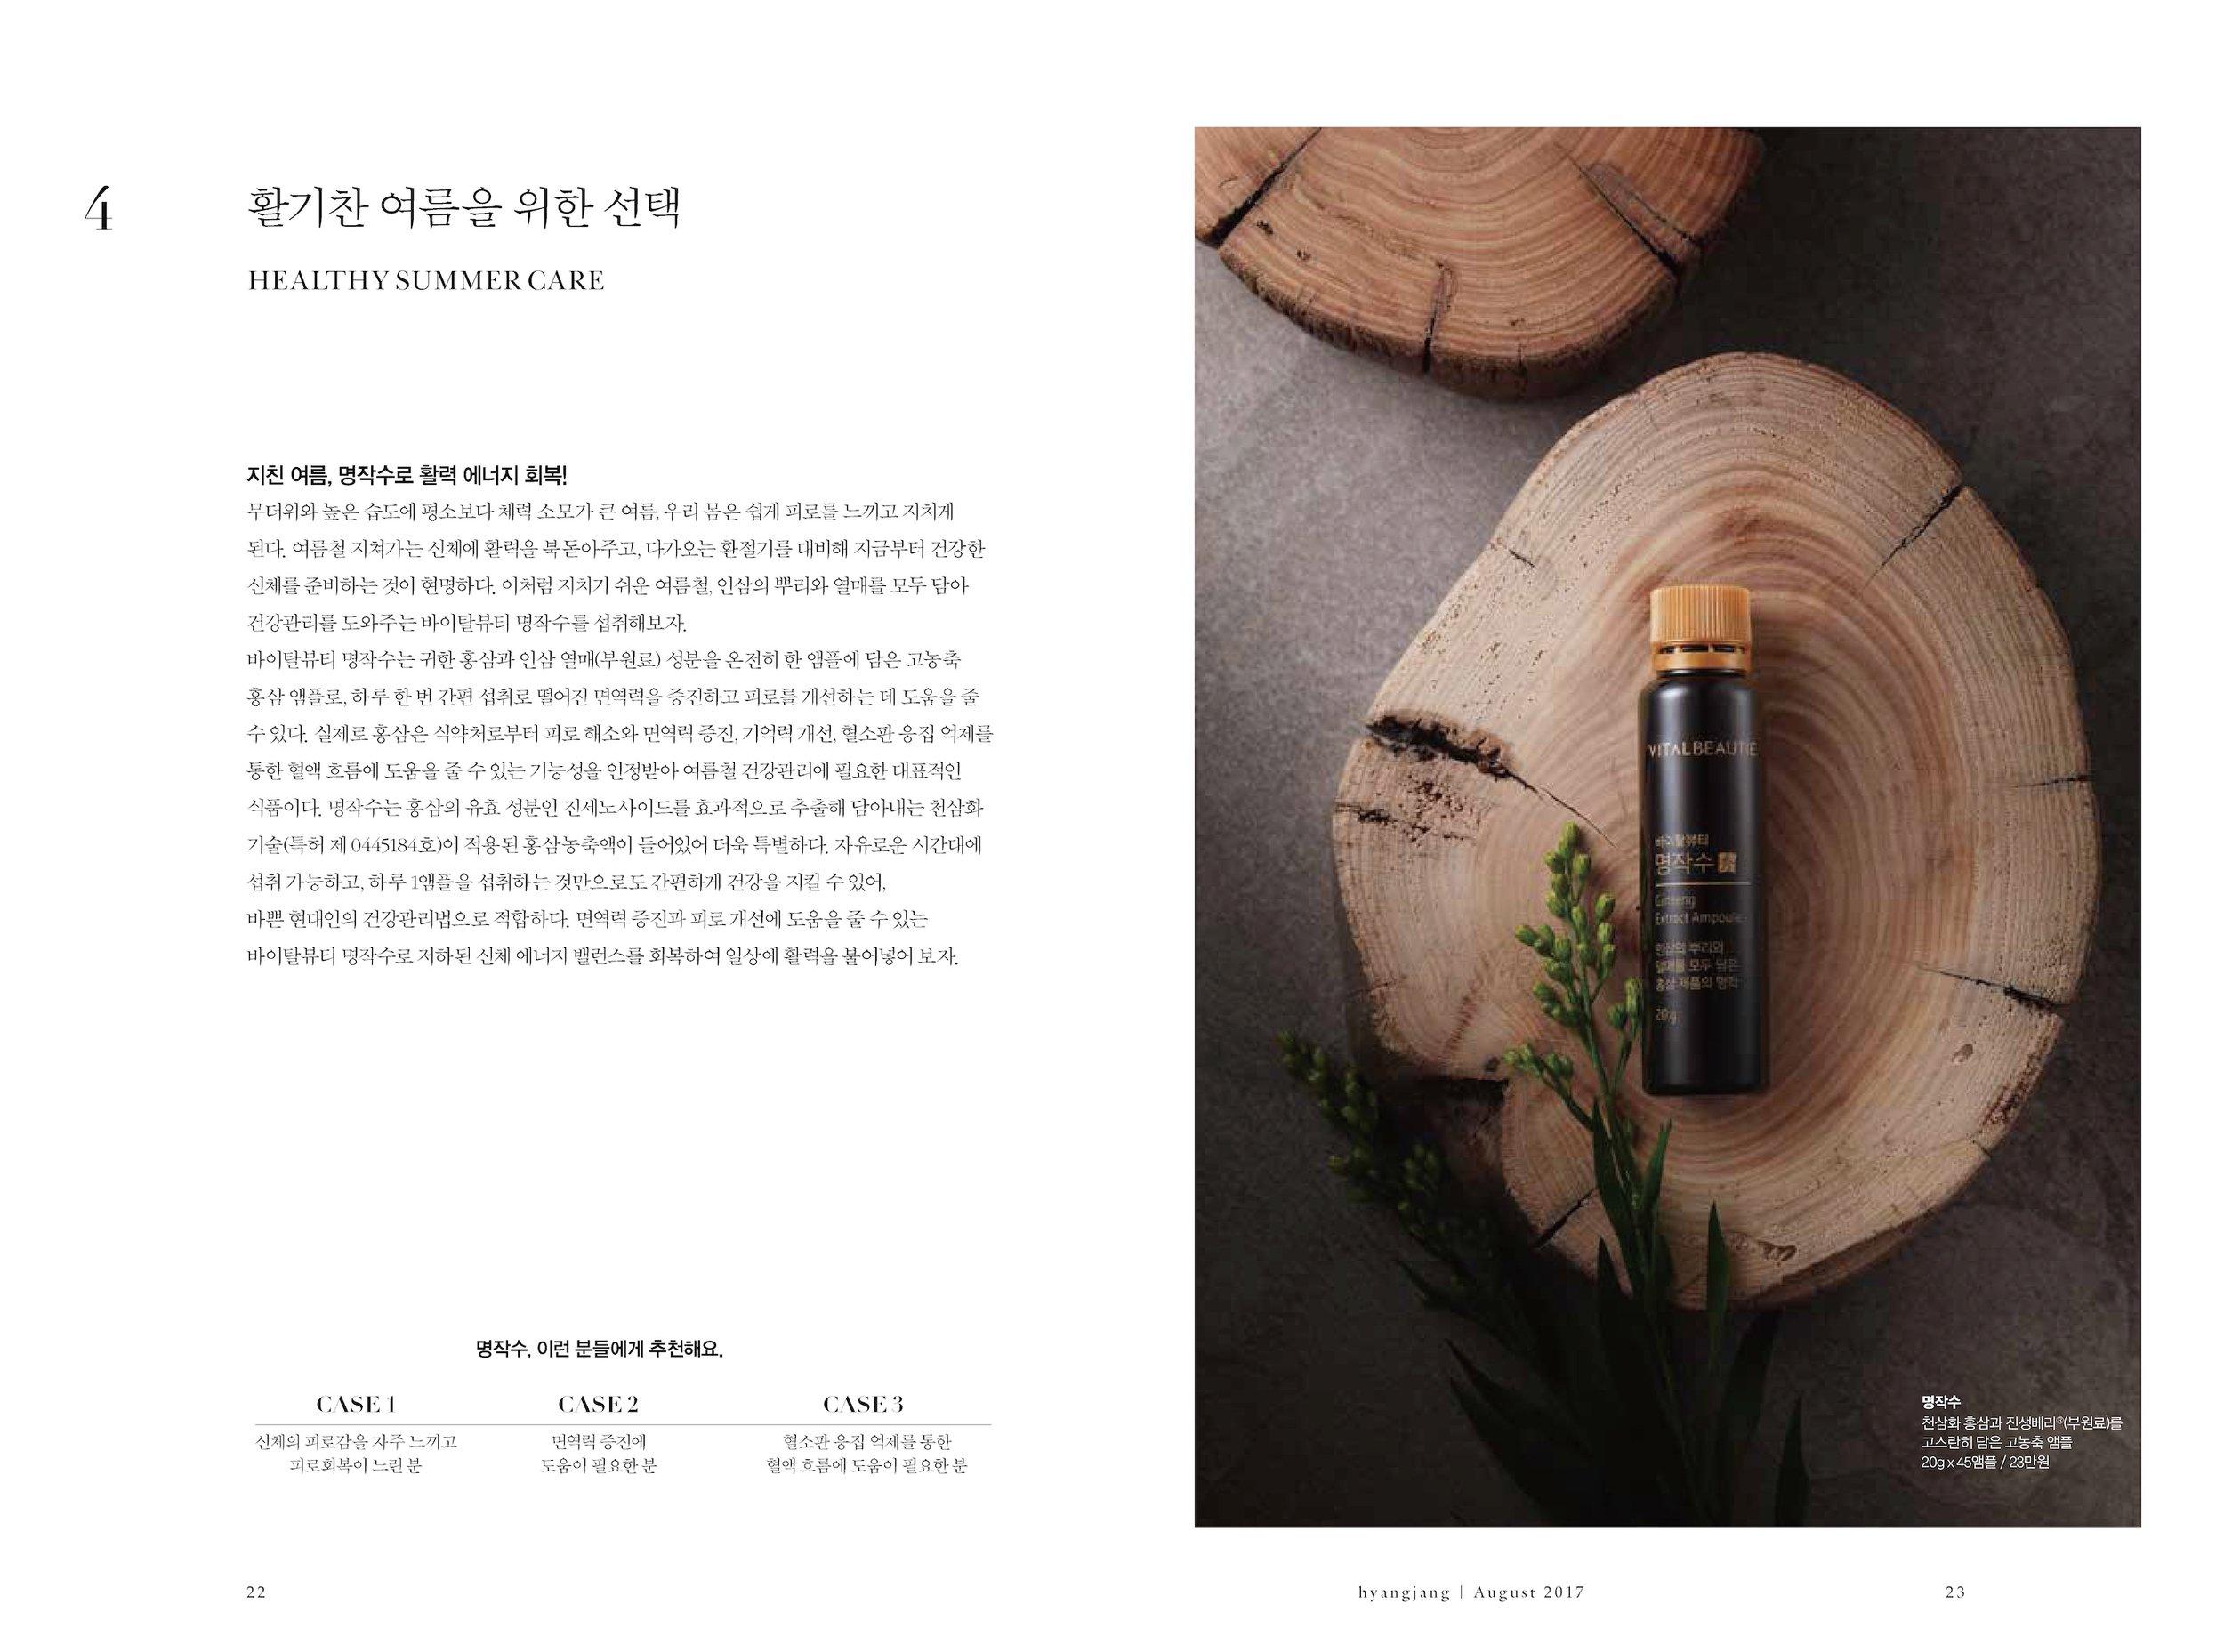 hyangjang-201708_페이지_11.jpeg